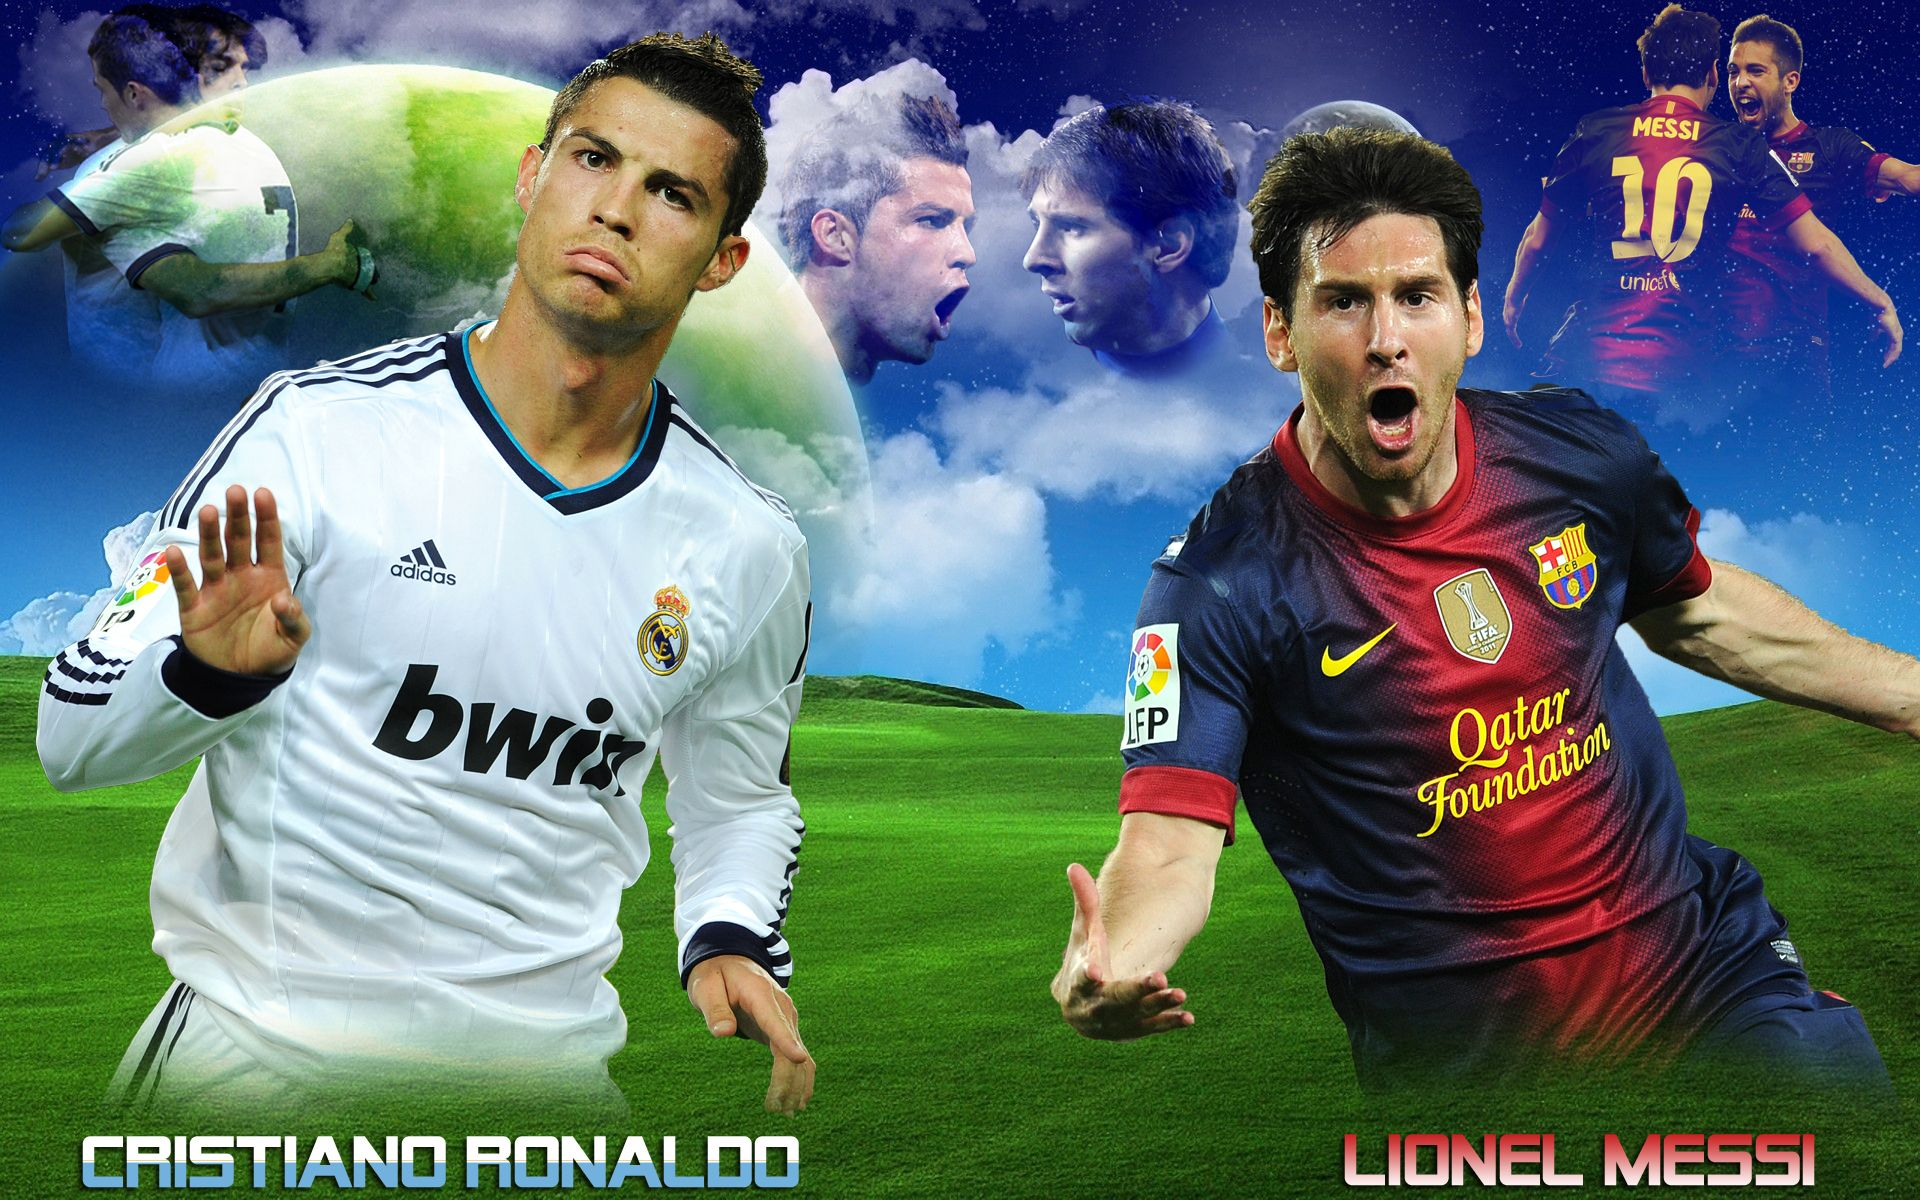 Lionel Messi Vs Cristiano Ronaldo The Movie 2015 Hd The Bettle Football Https Www Youtube Com Watch V Y Wnptygkwy Messi Vs Ronaldo Lionel Messi Ronaldo